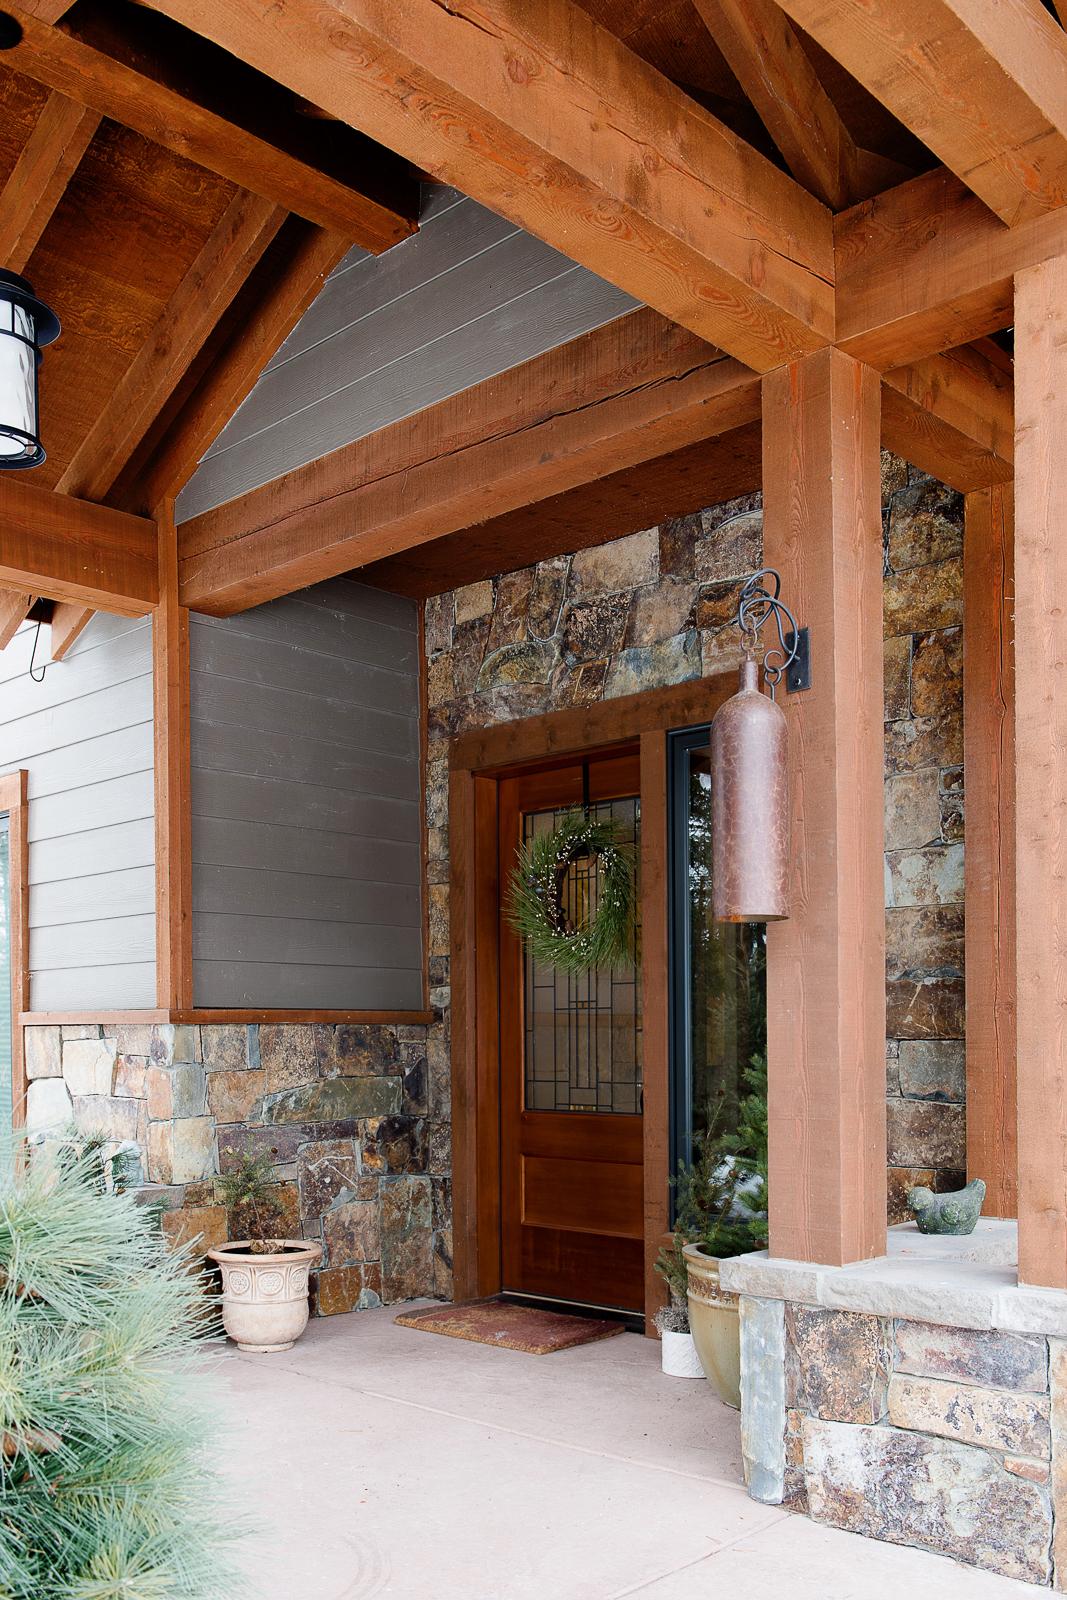 Woodworks-West-Bozeman-Montana-Builder-Cabinetry-Remodel-New-Construction-3689.jpg